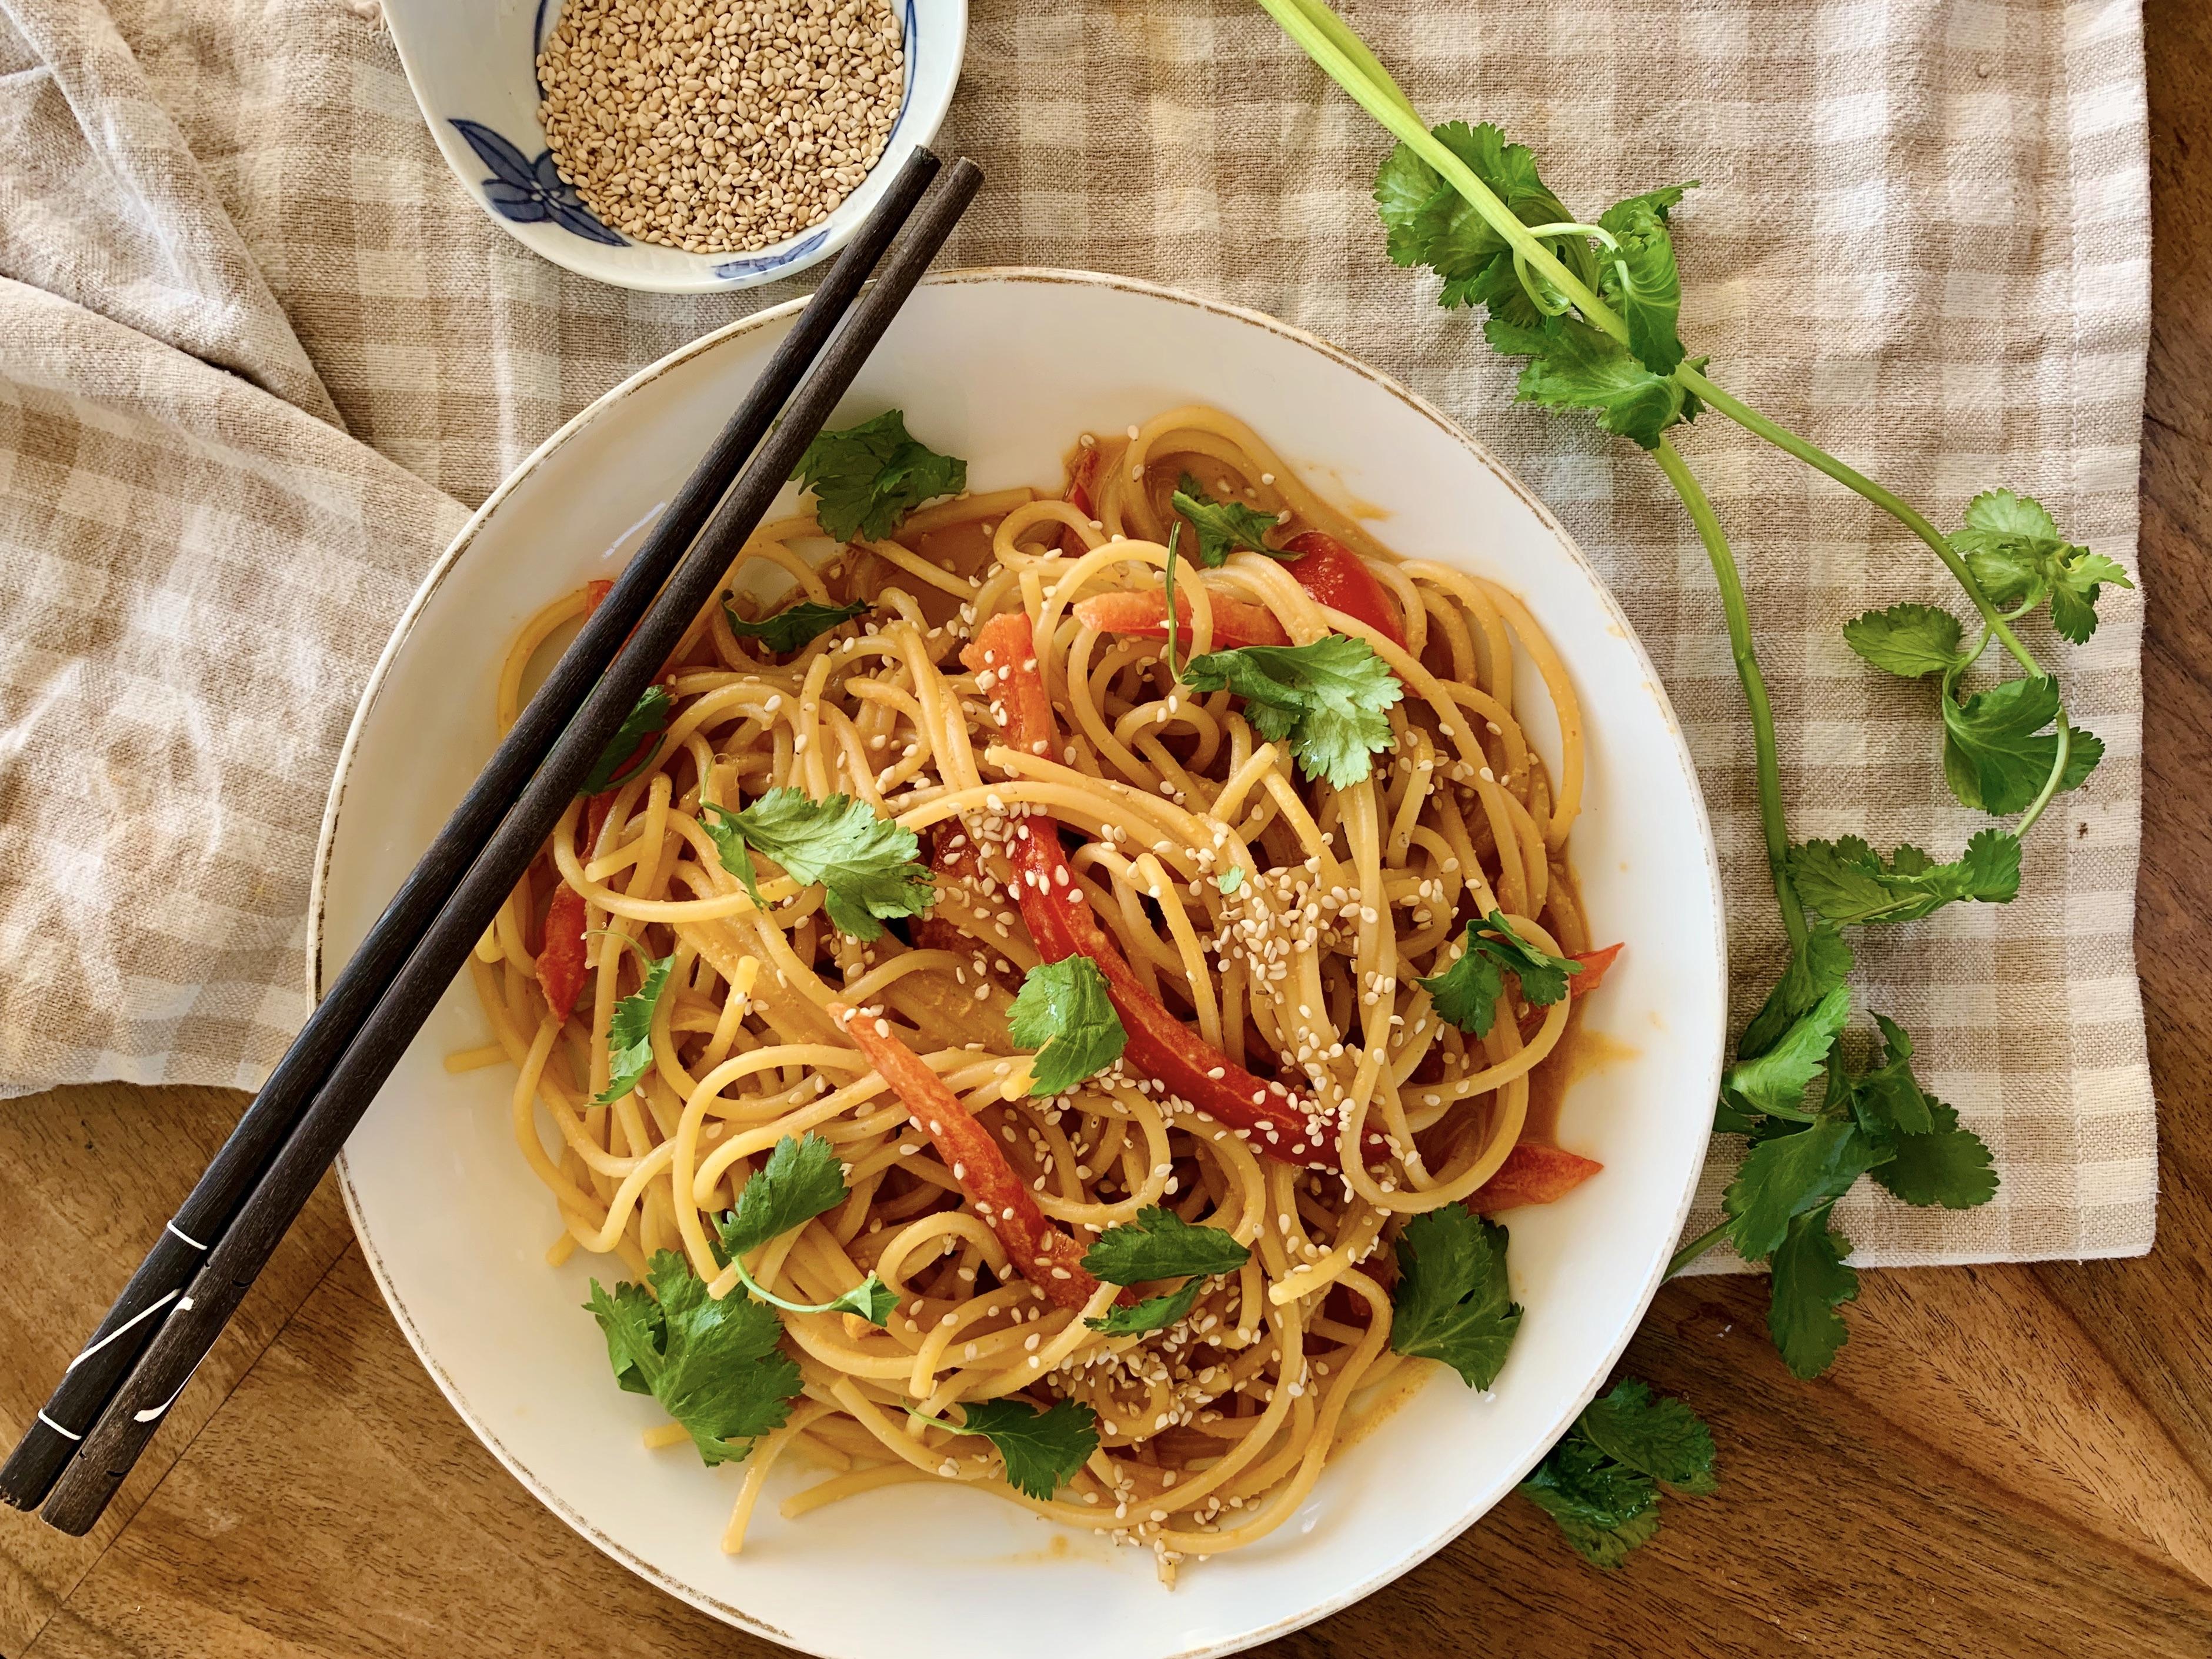 Spicy sesame peanut butter noodles